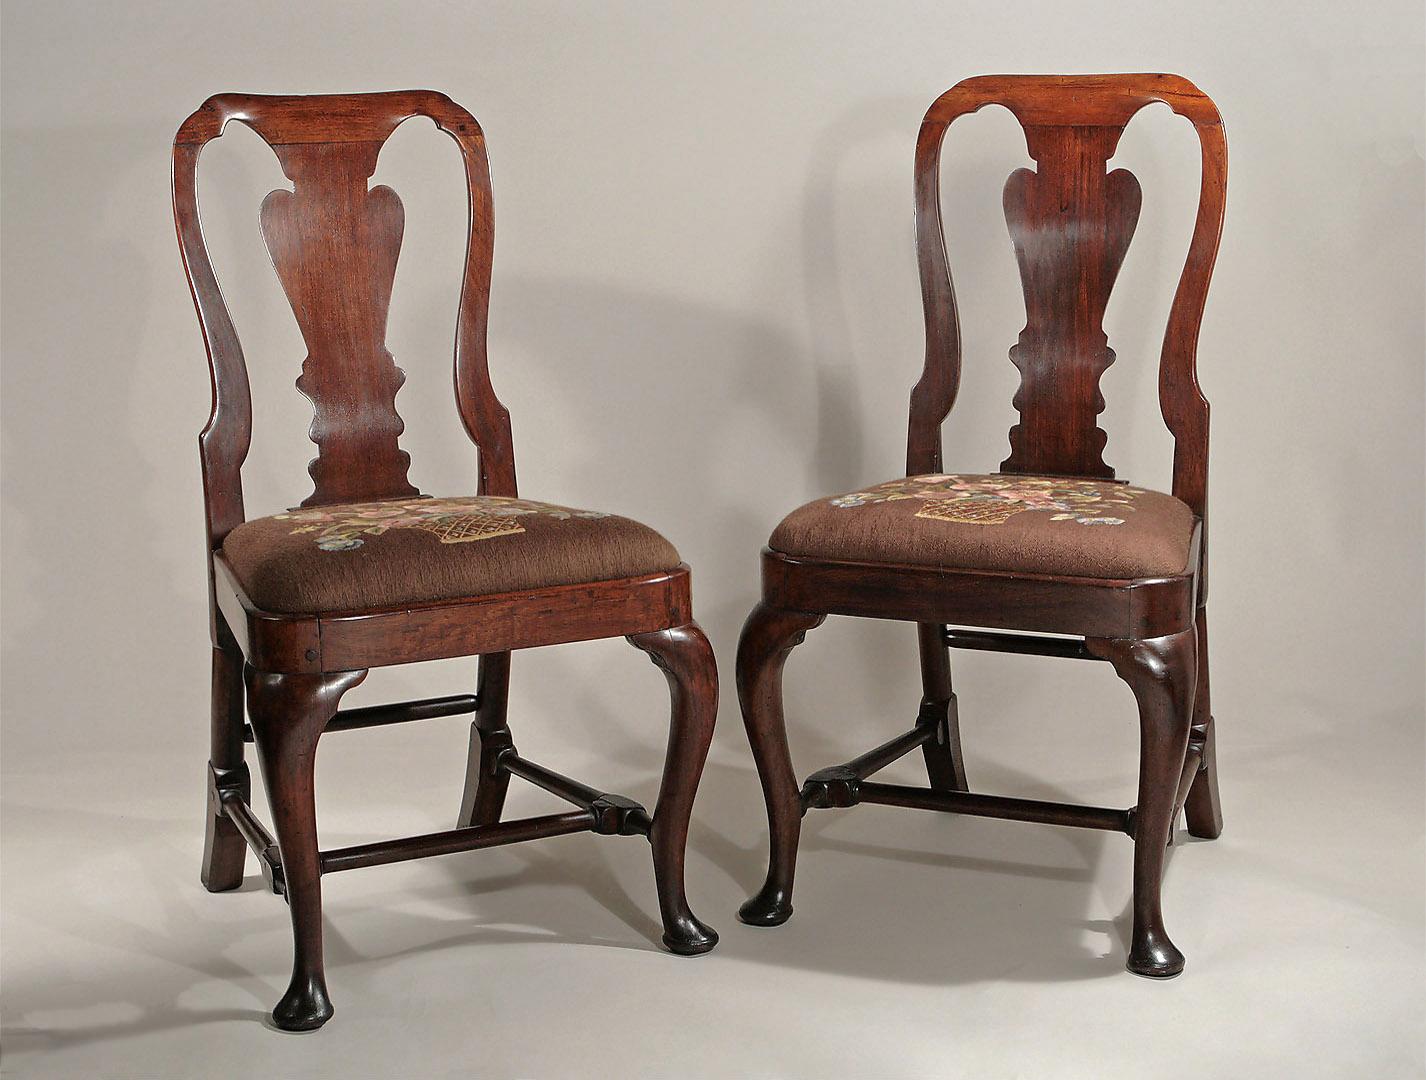 Queen Anne Chair Covers Part 207 Fresh 10 Queen Anne  : PrQueenAnneGeorgeISidechairs1 21426w20 from www.theridgewayinn.com size 1426 x 1080 jpeg 254kB